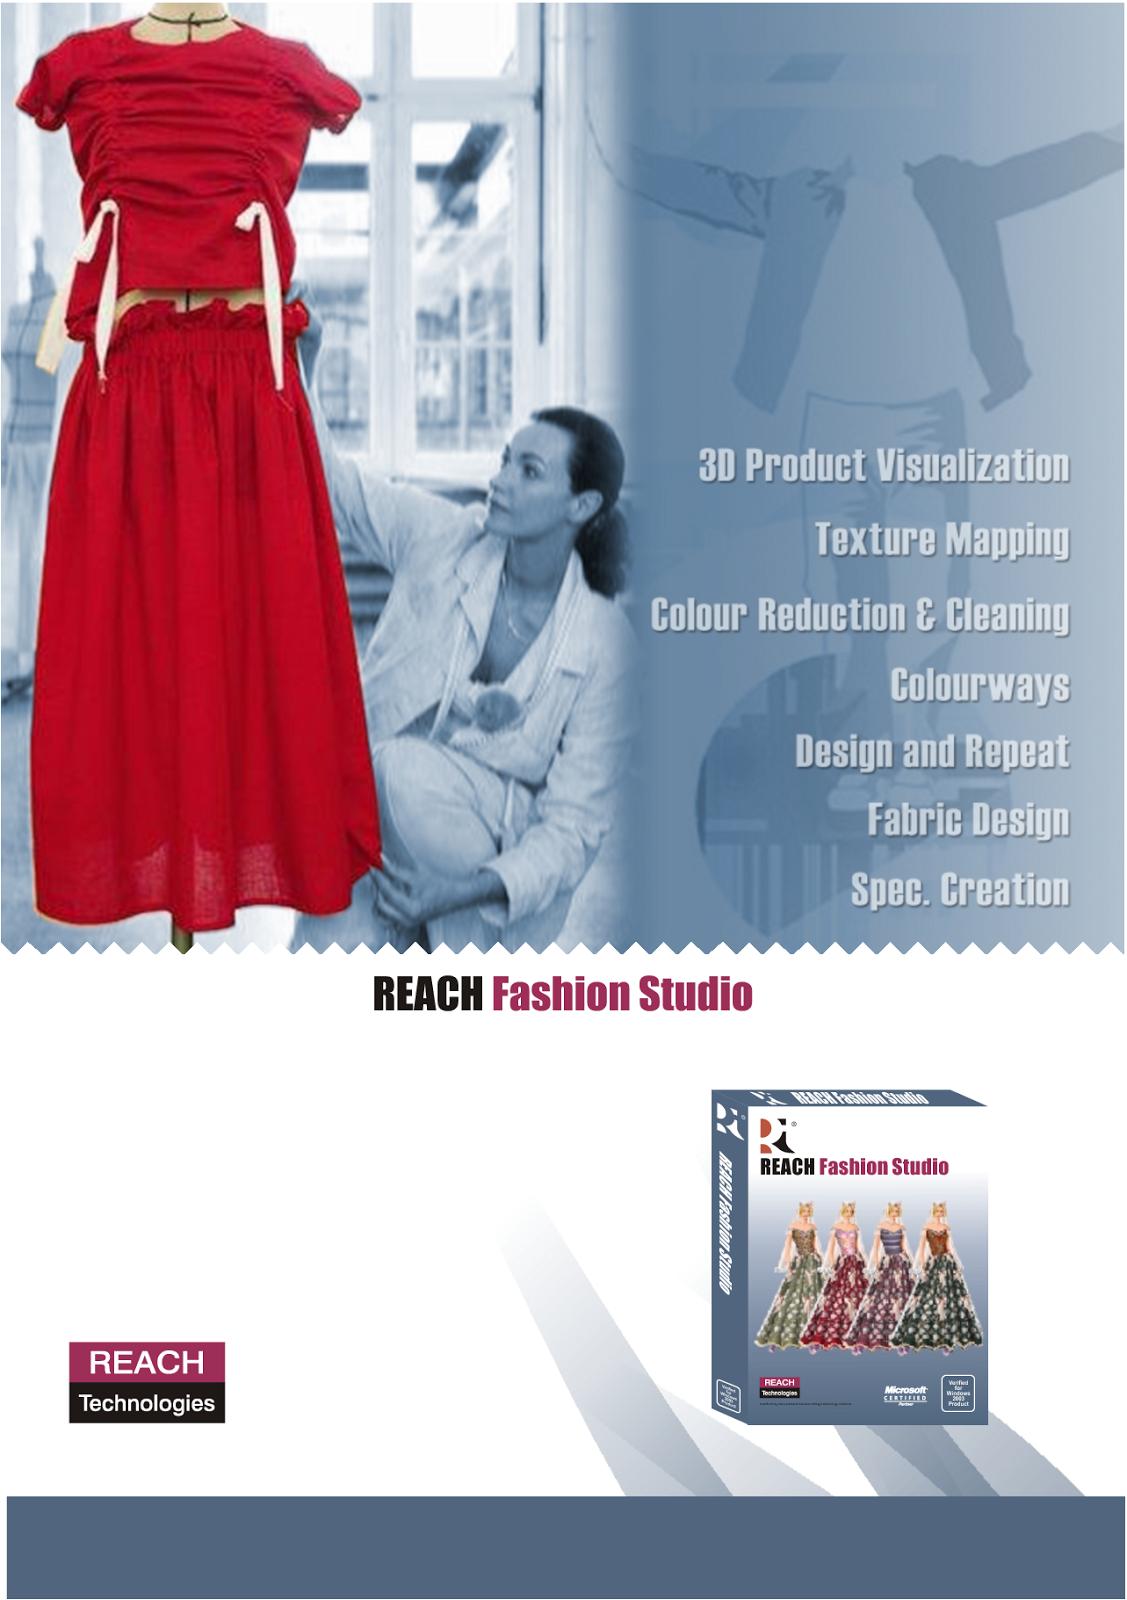 Indian Beauty Blog Fashion Lifestyle Makeup Sparklewithsurabhi Reach Fashion Studio